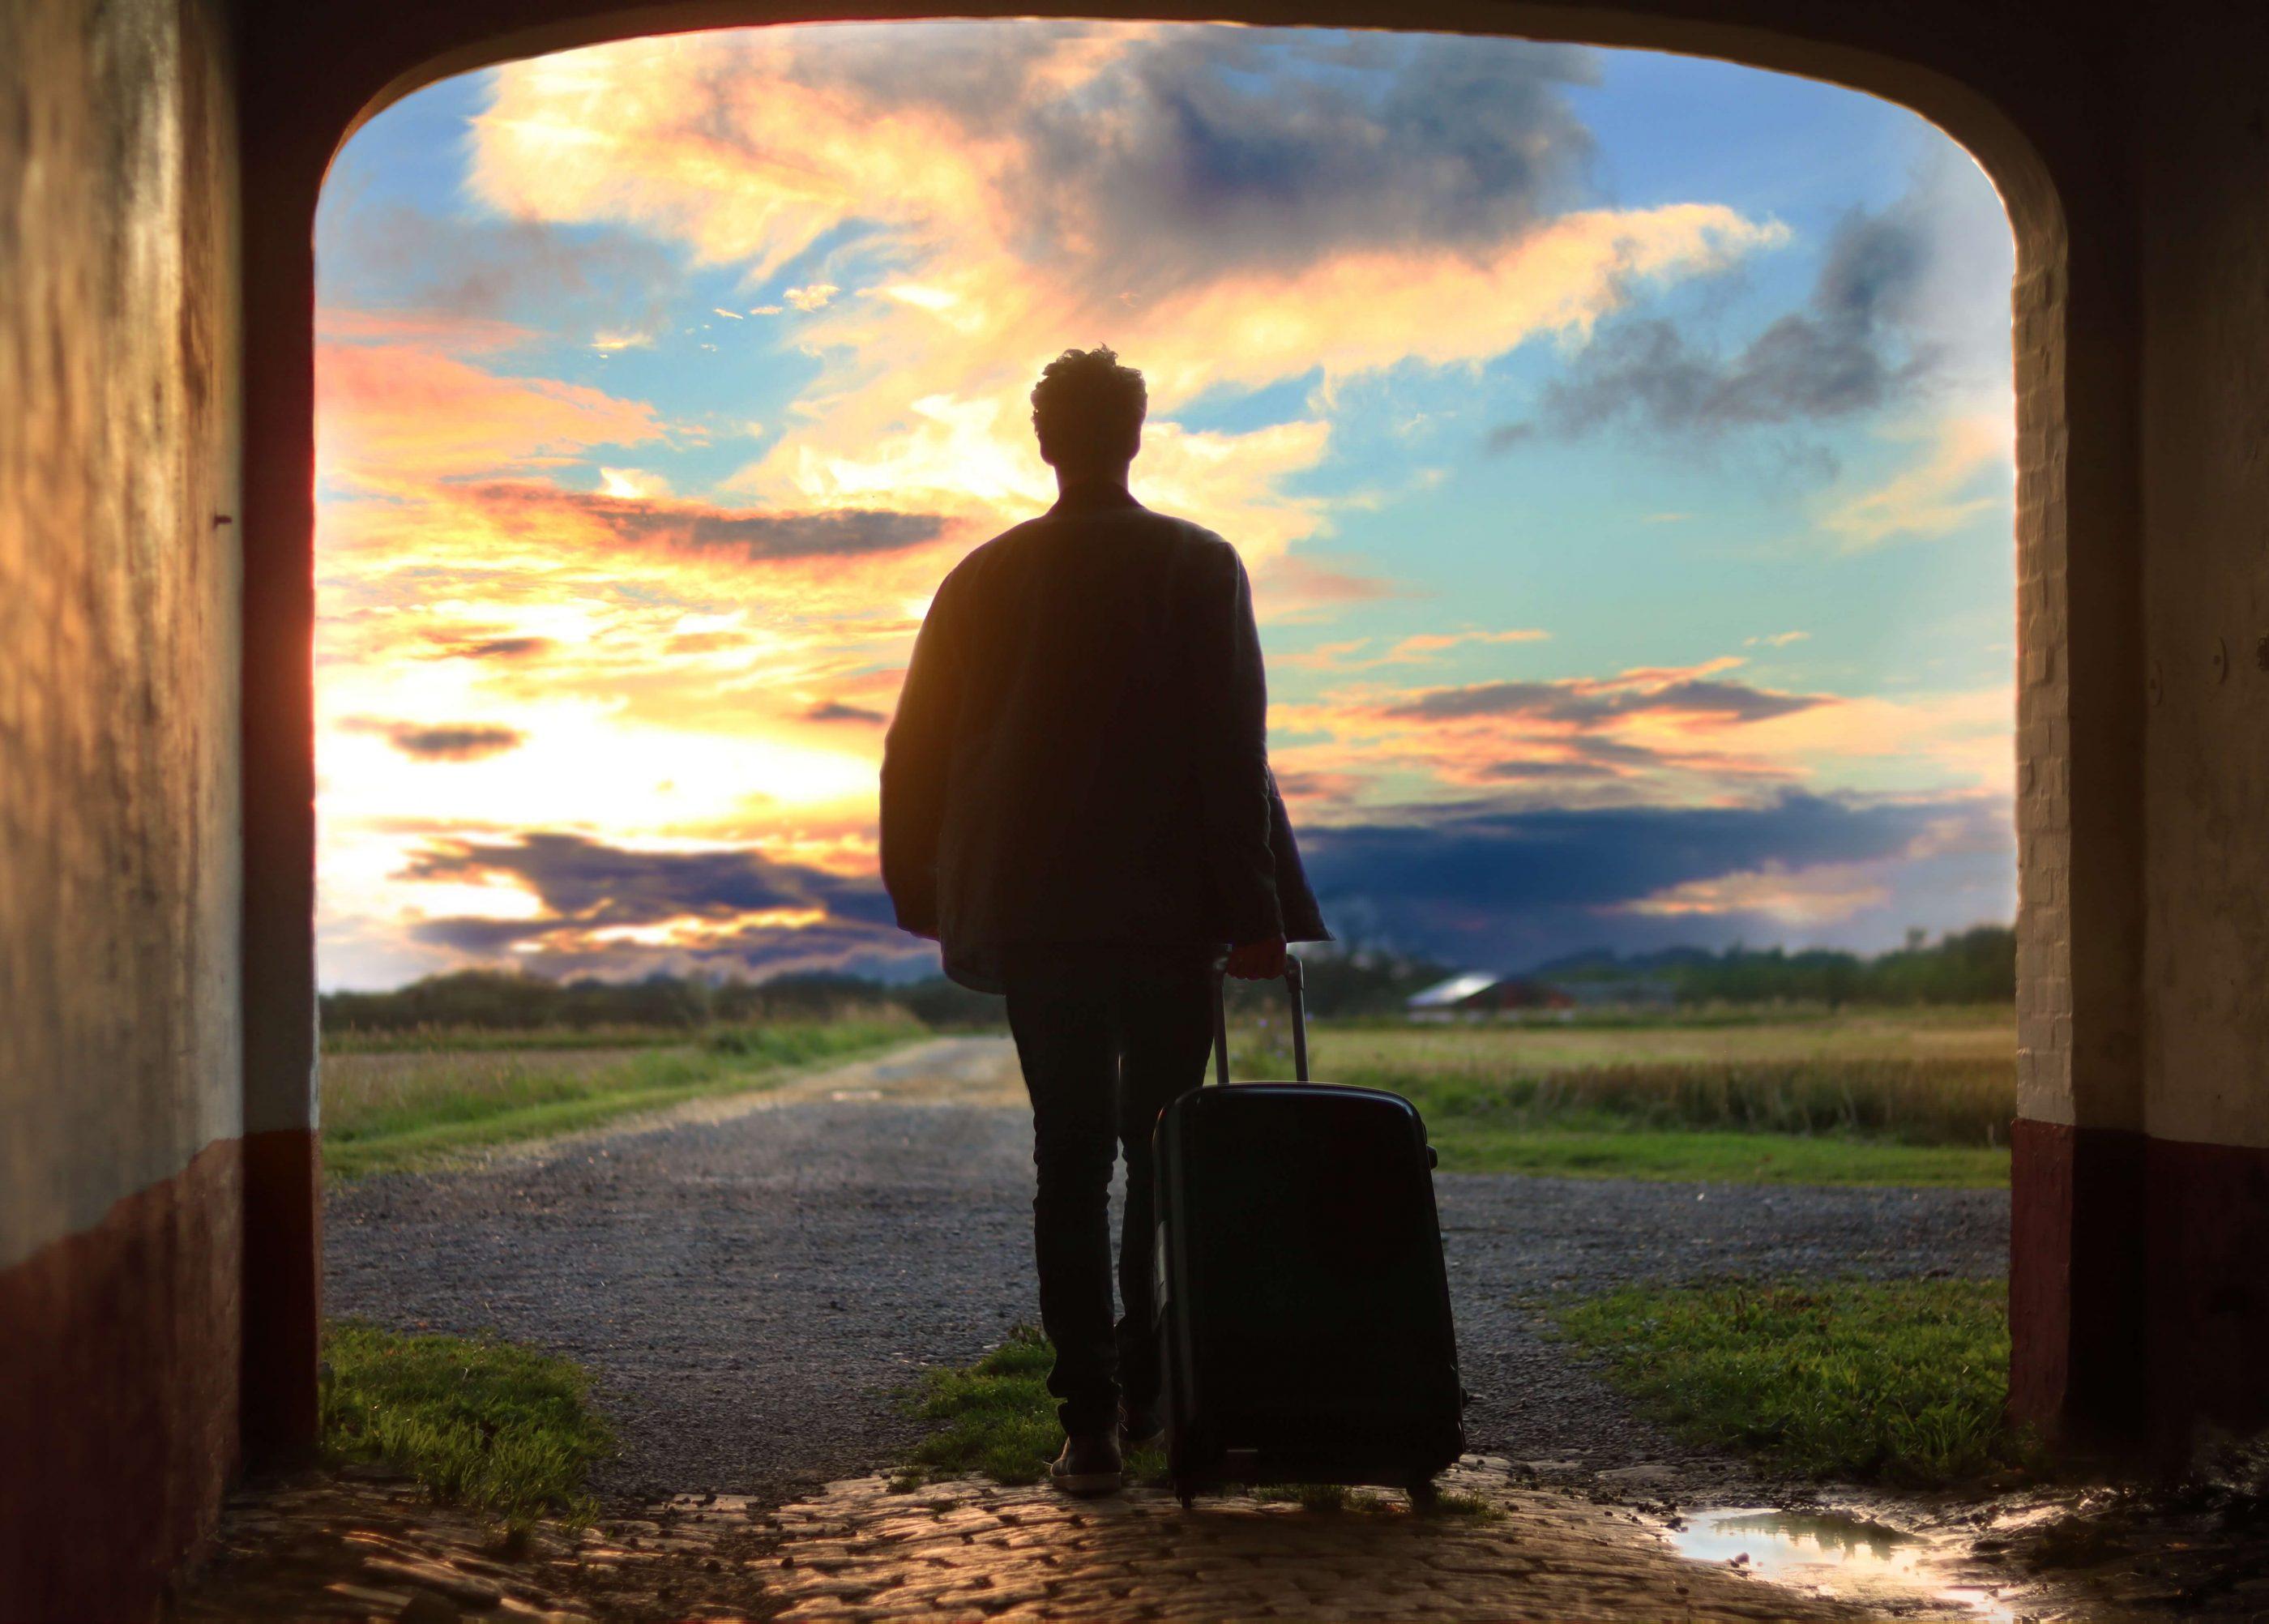 travel icebreaker questions